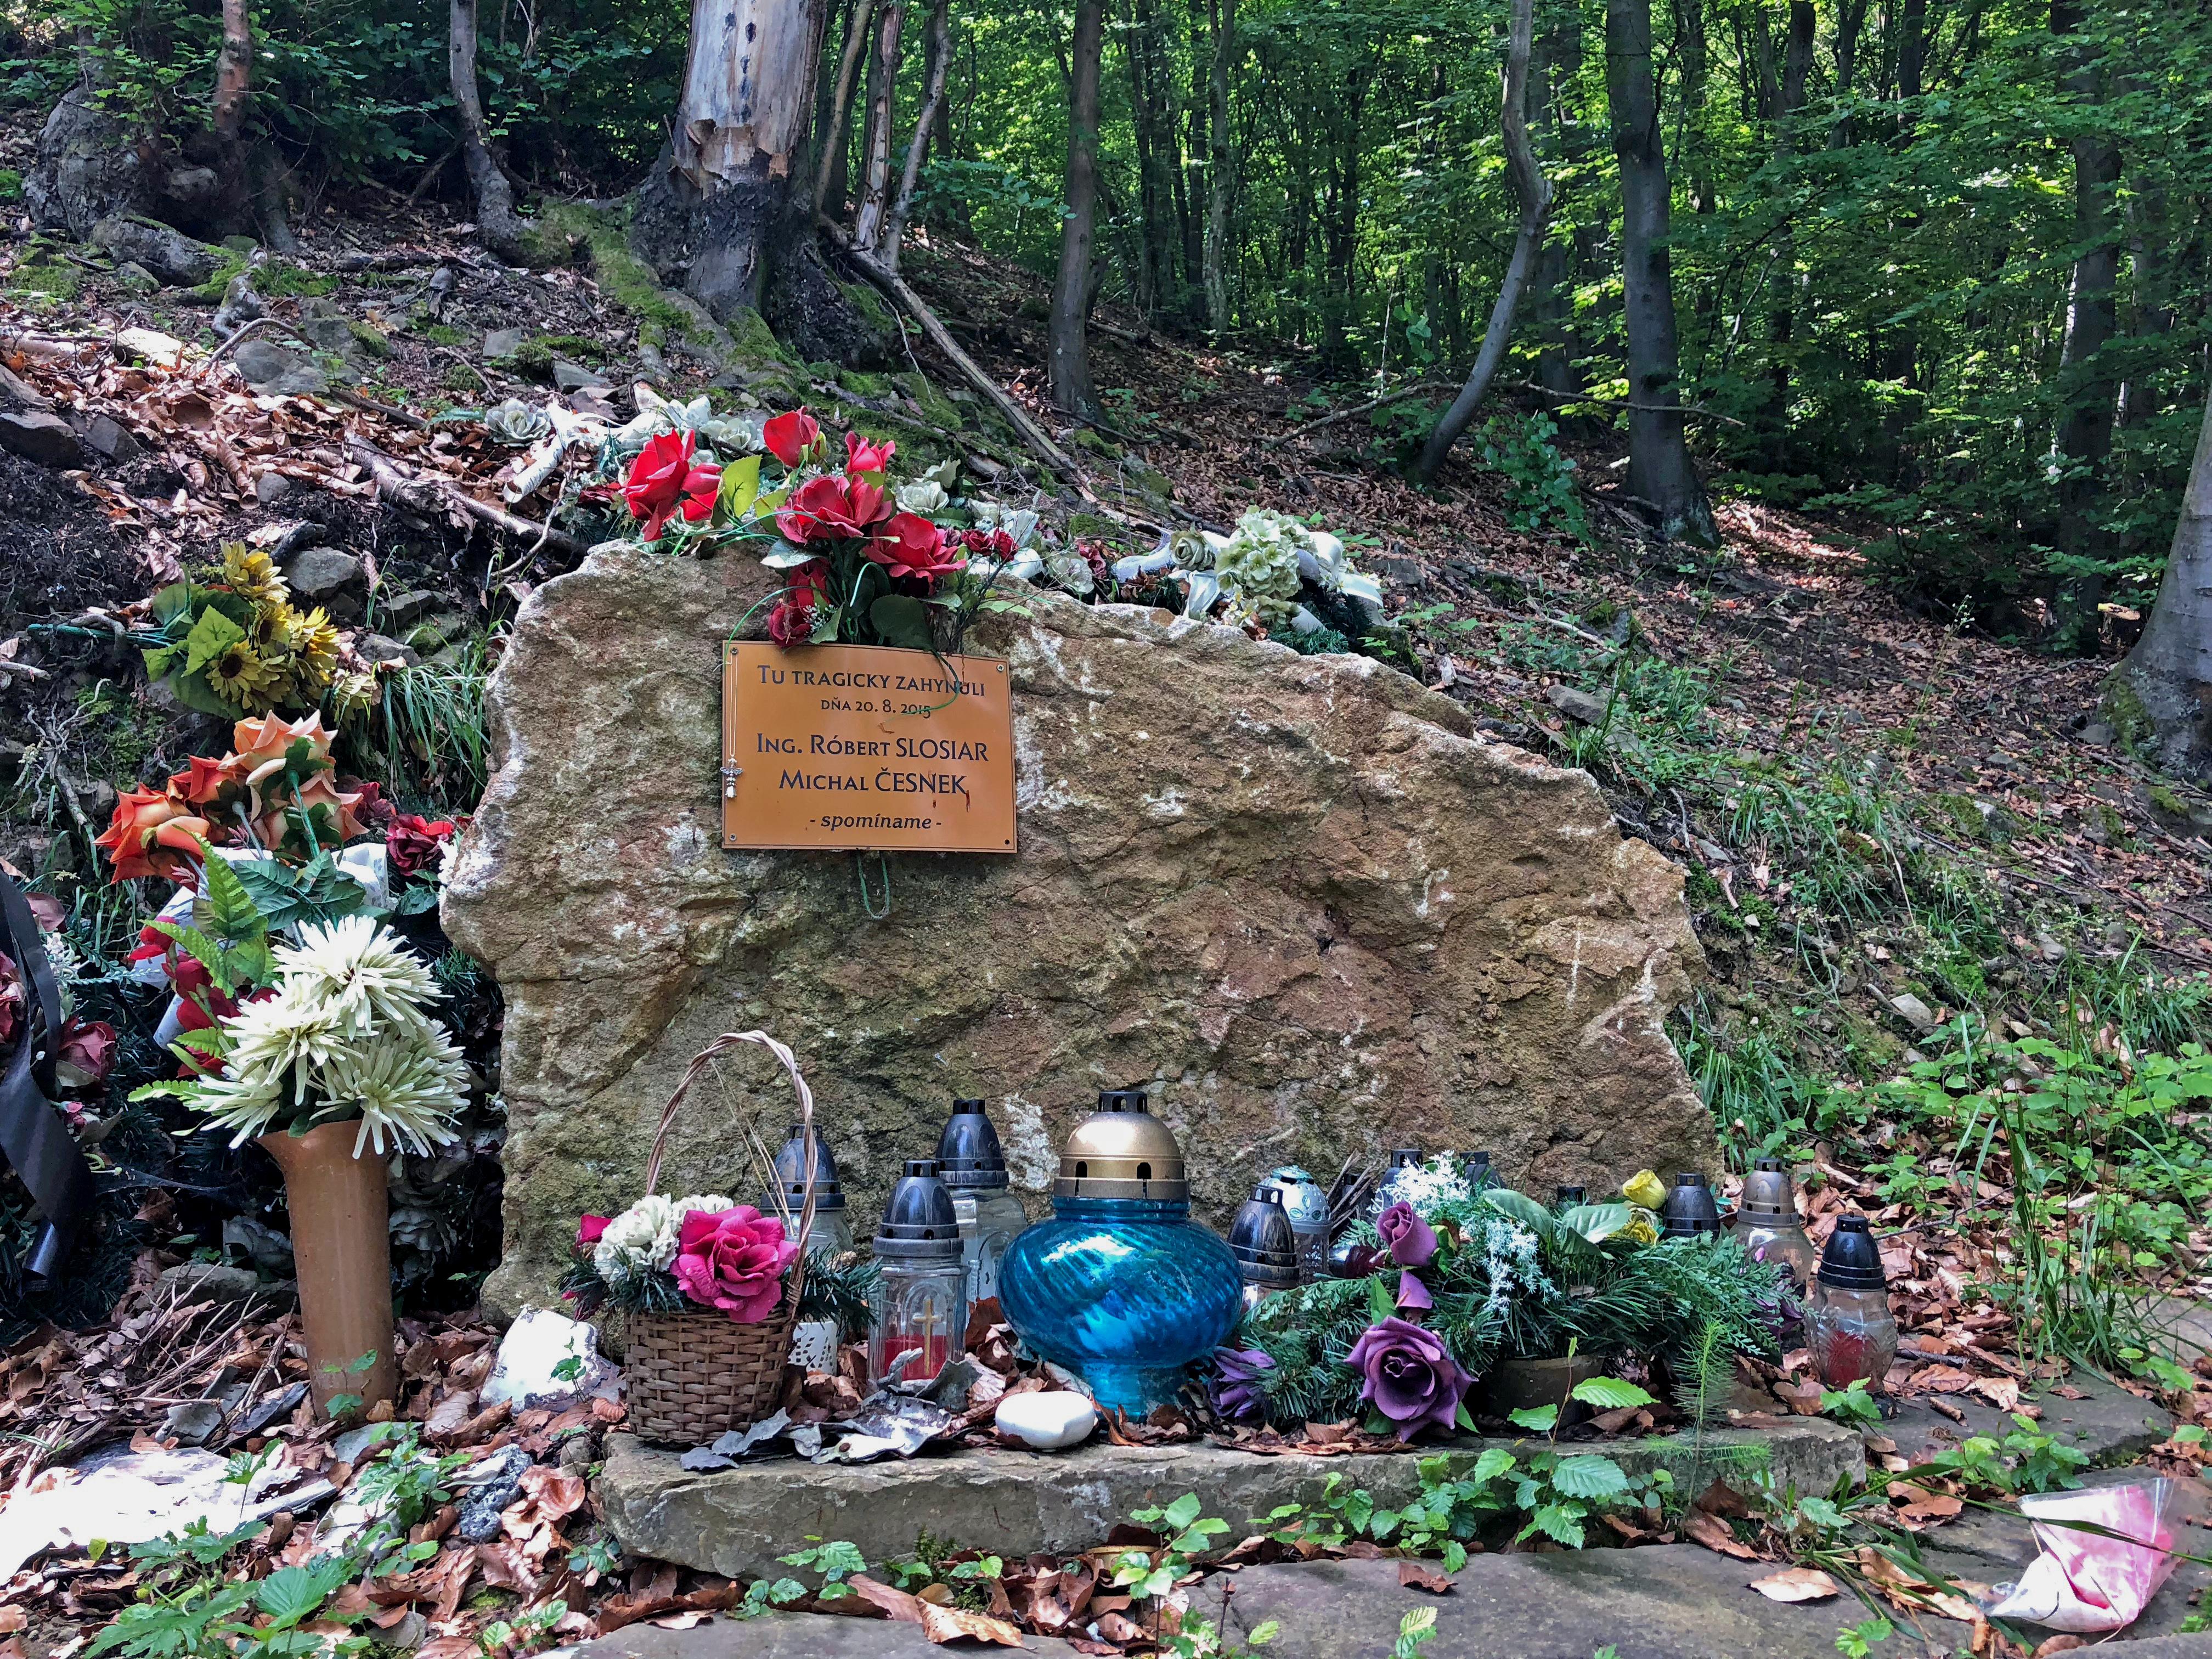 pamätník OM-SAB (Robo Slosiar, Mišo Česnek)